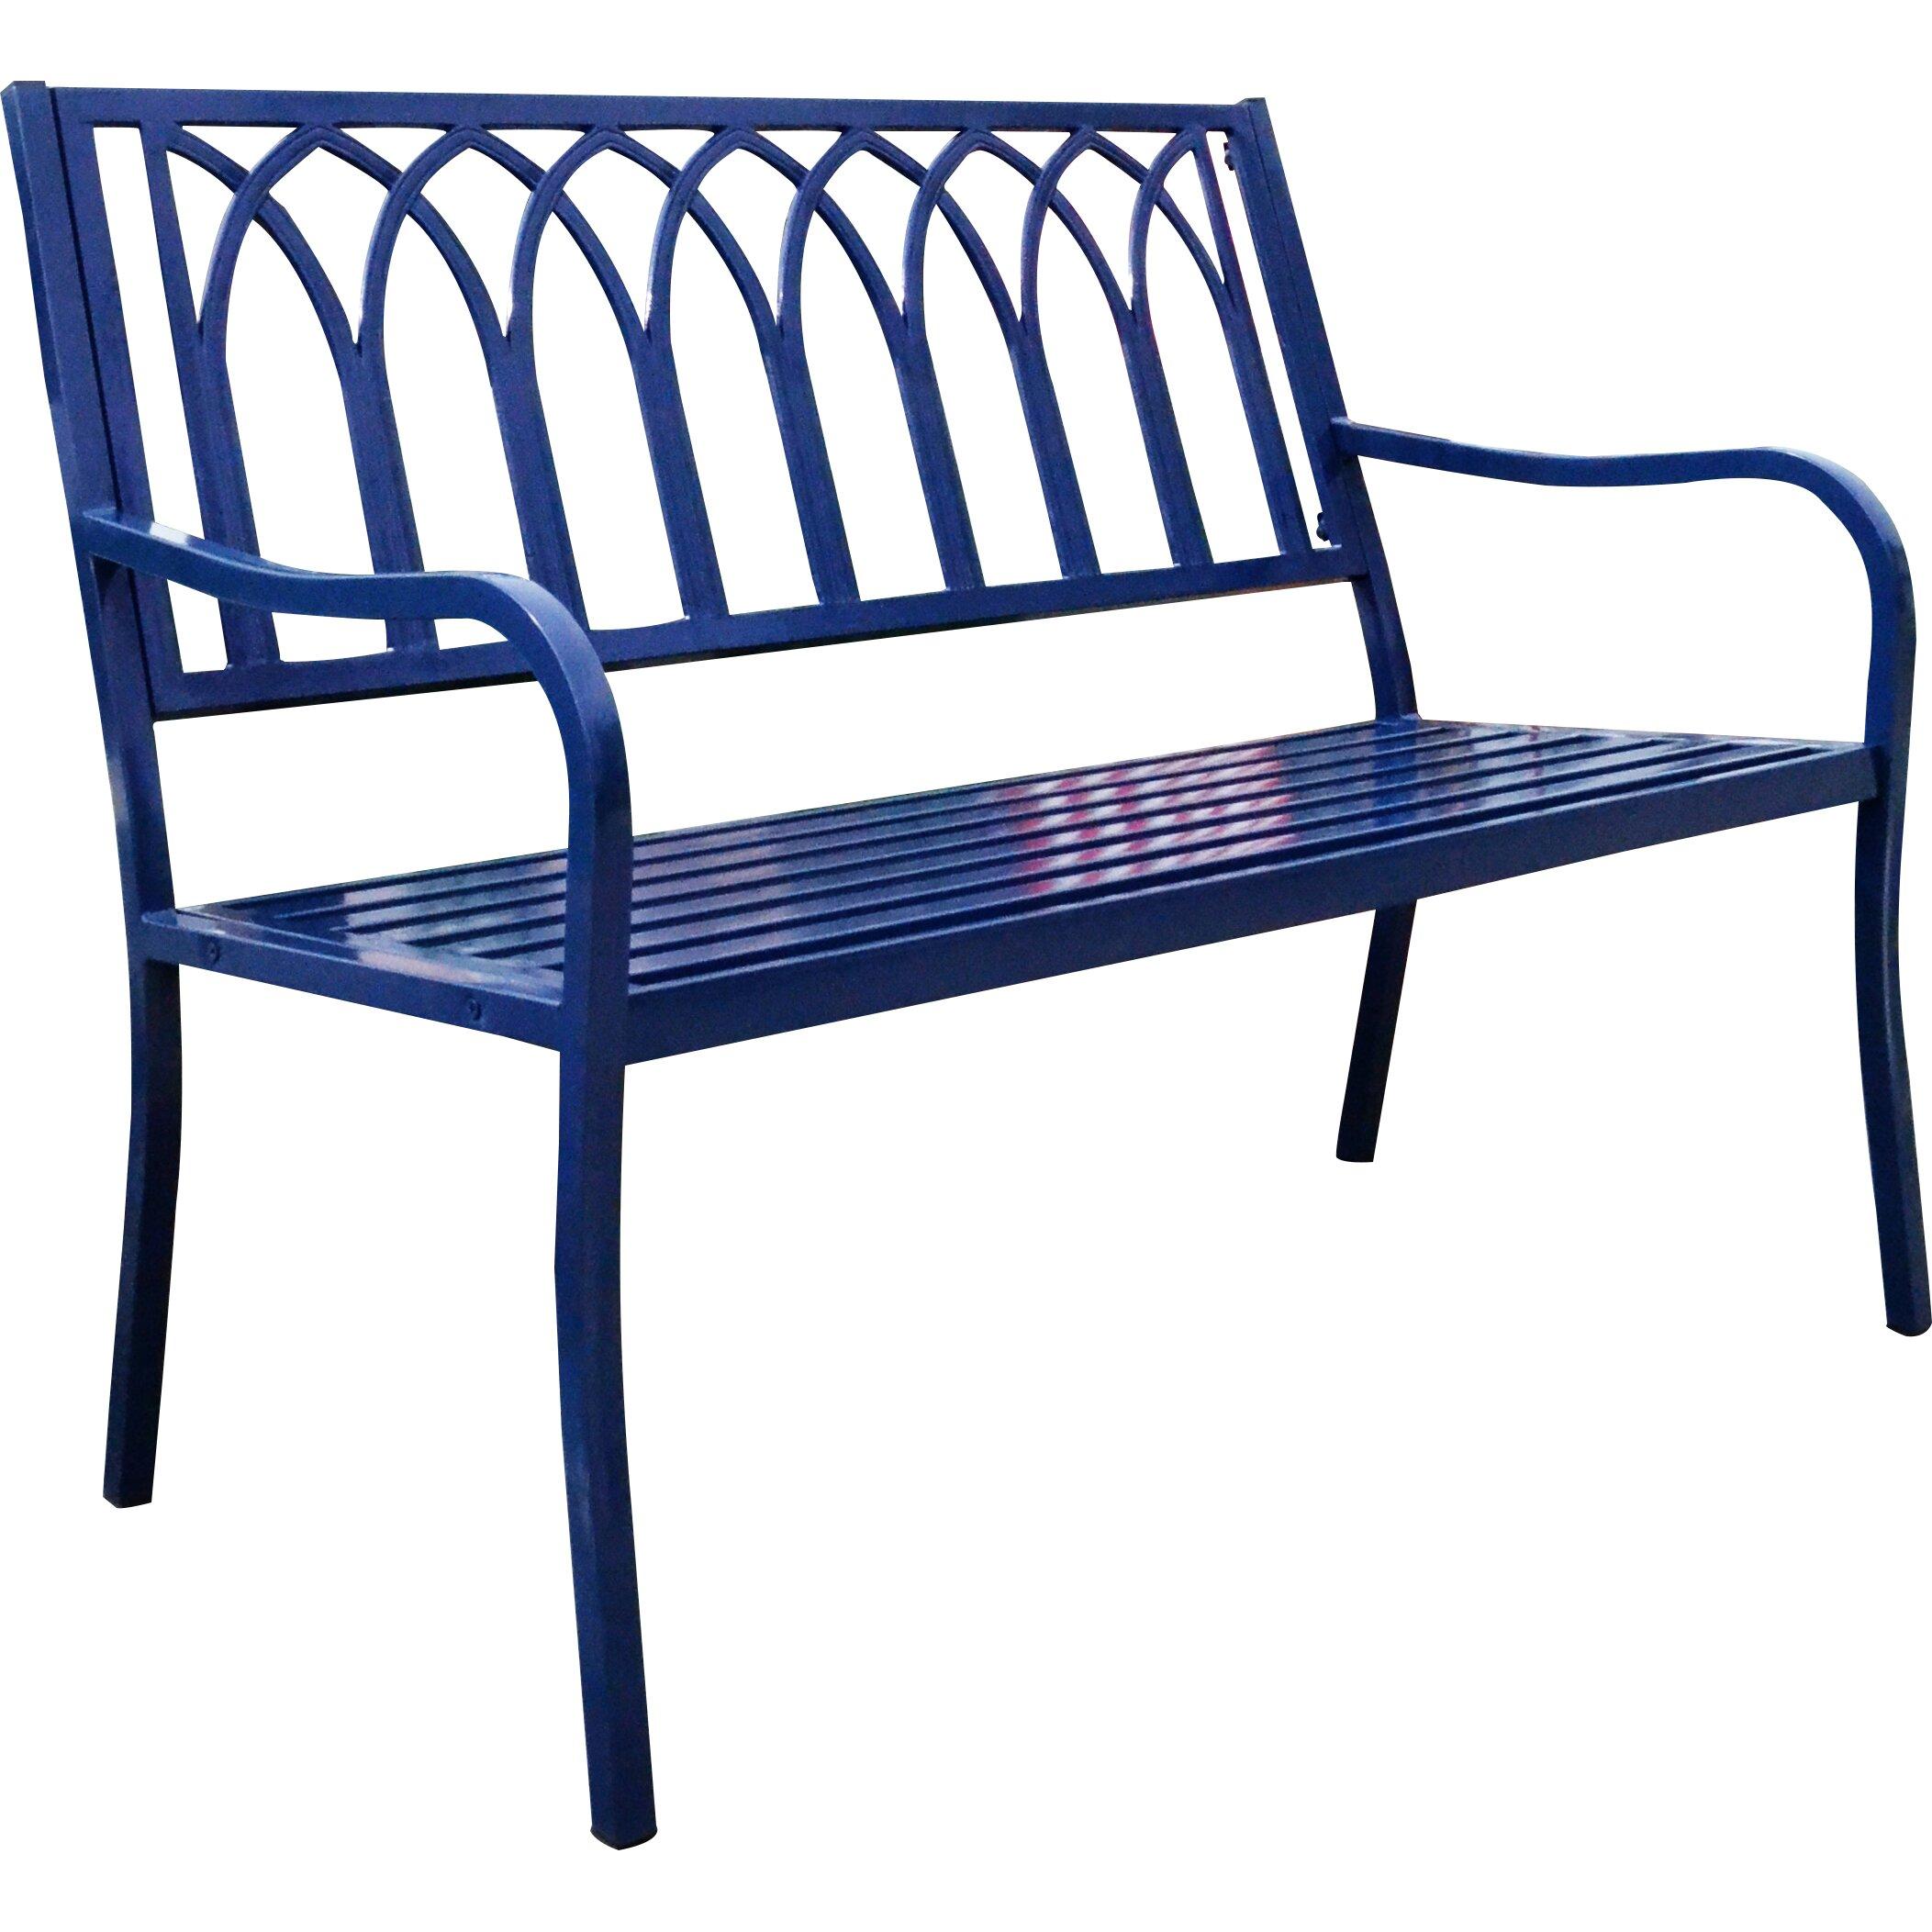 Hearth Bench: Innova Hearth And Home Lakeside Steel Garden Bench